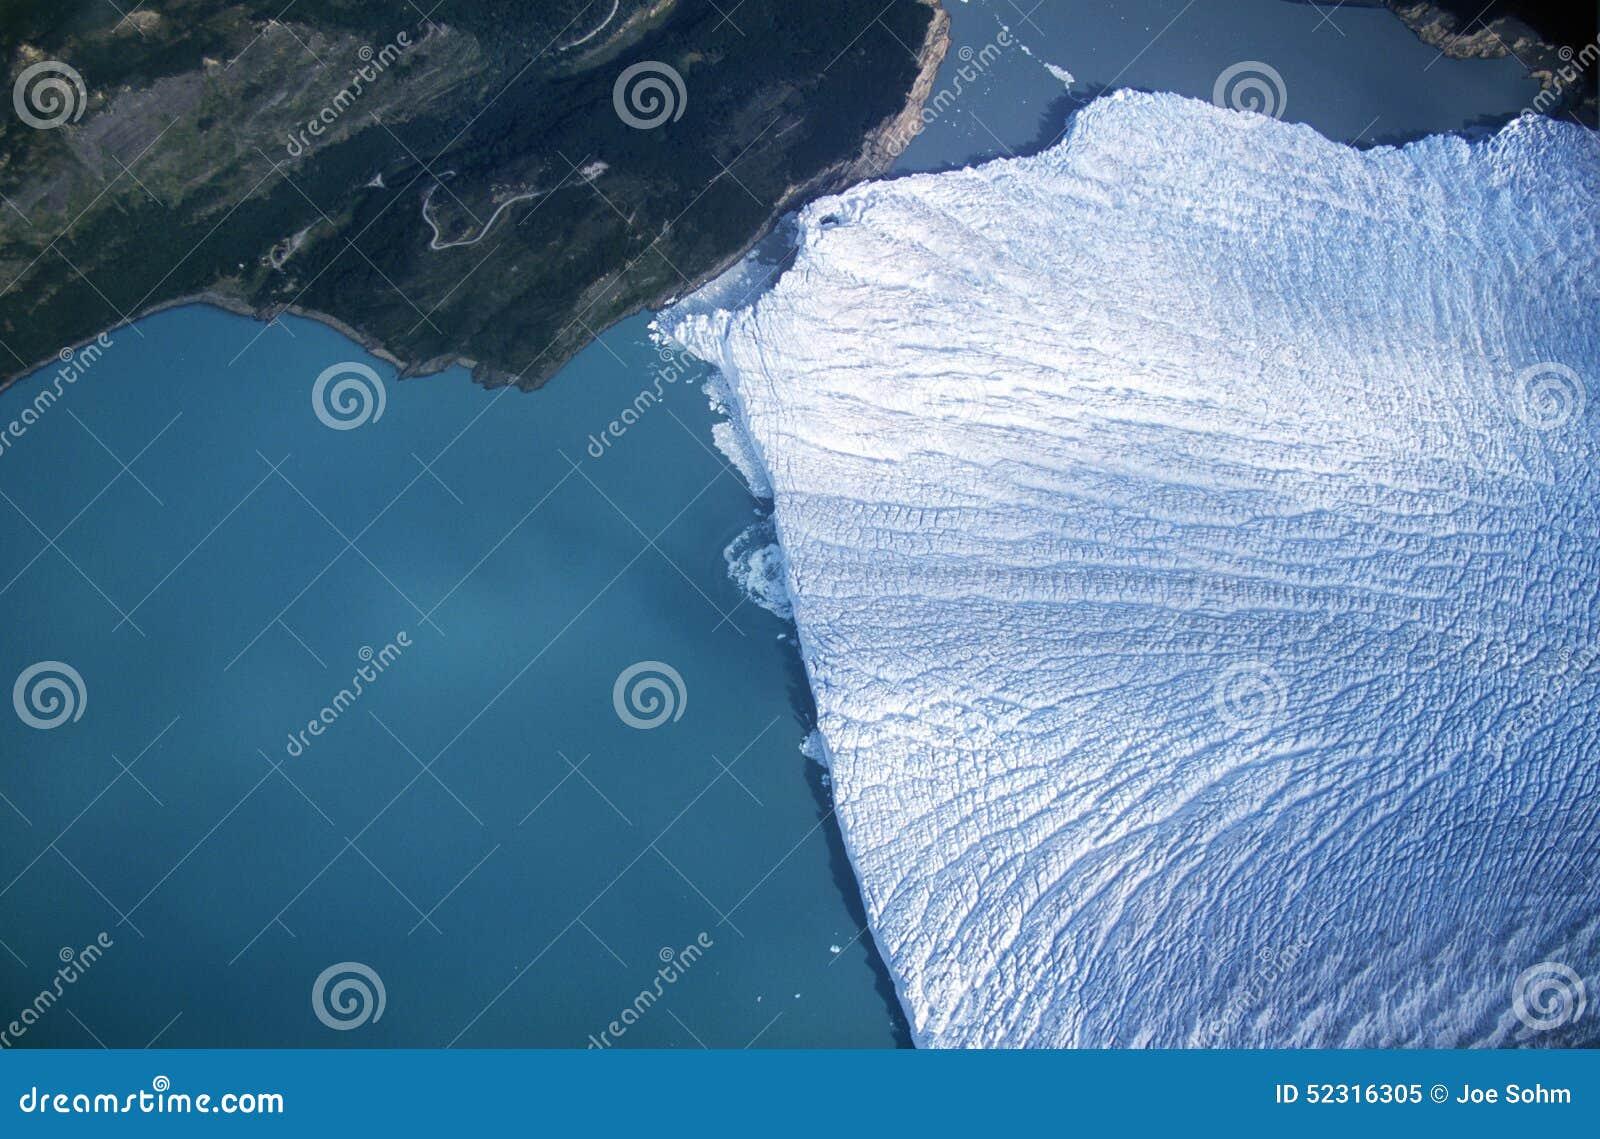 Widok z lotu ptaka Perito Moreno lodowiec blisko El Calafate, Patagonia, Argentyna